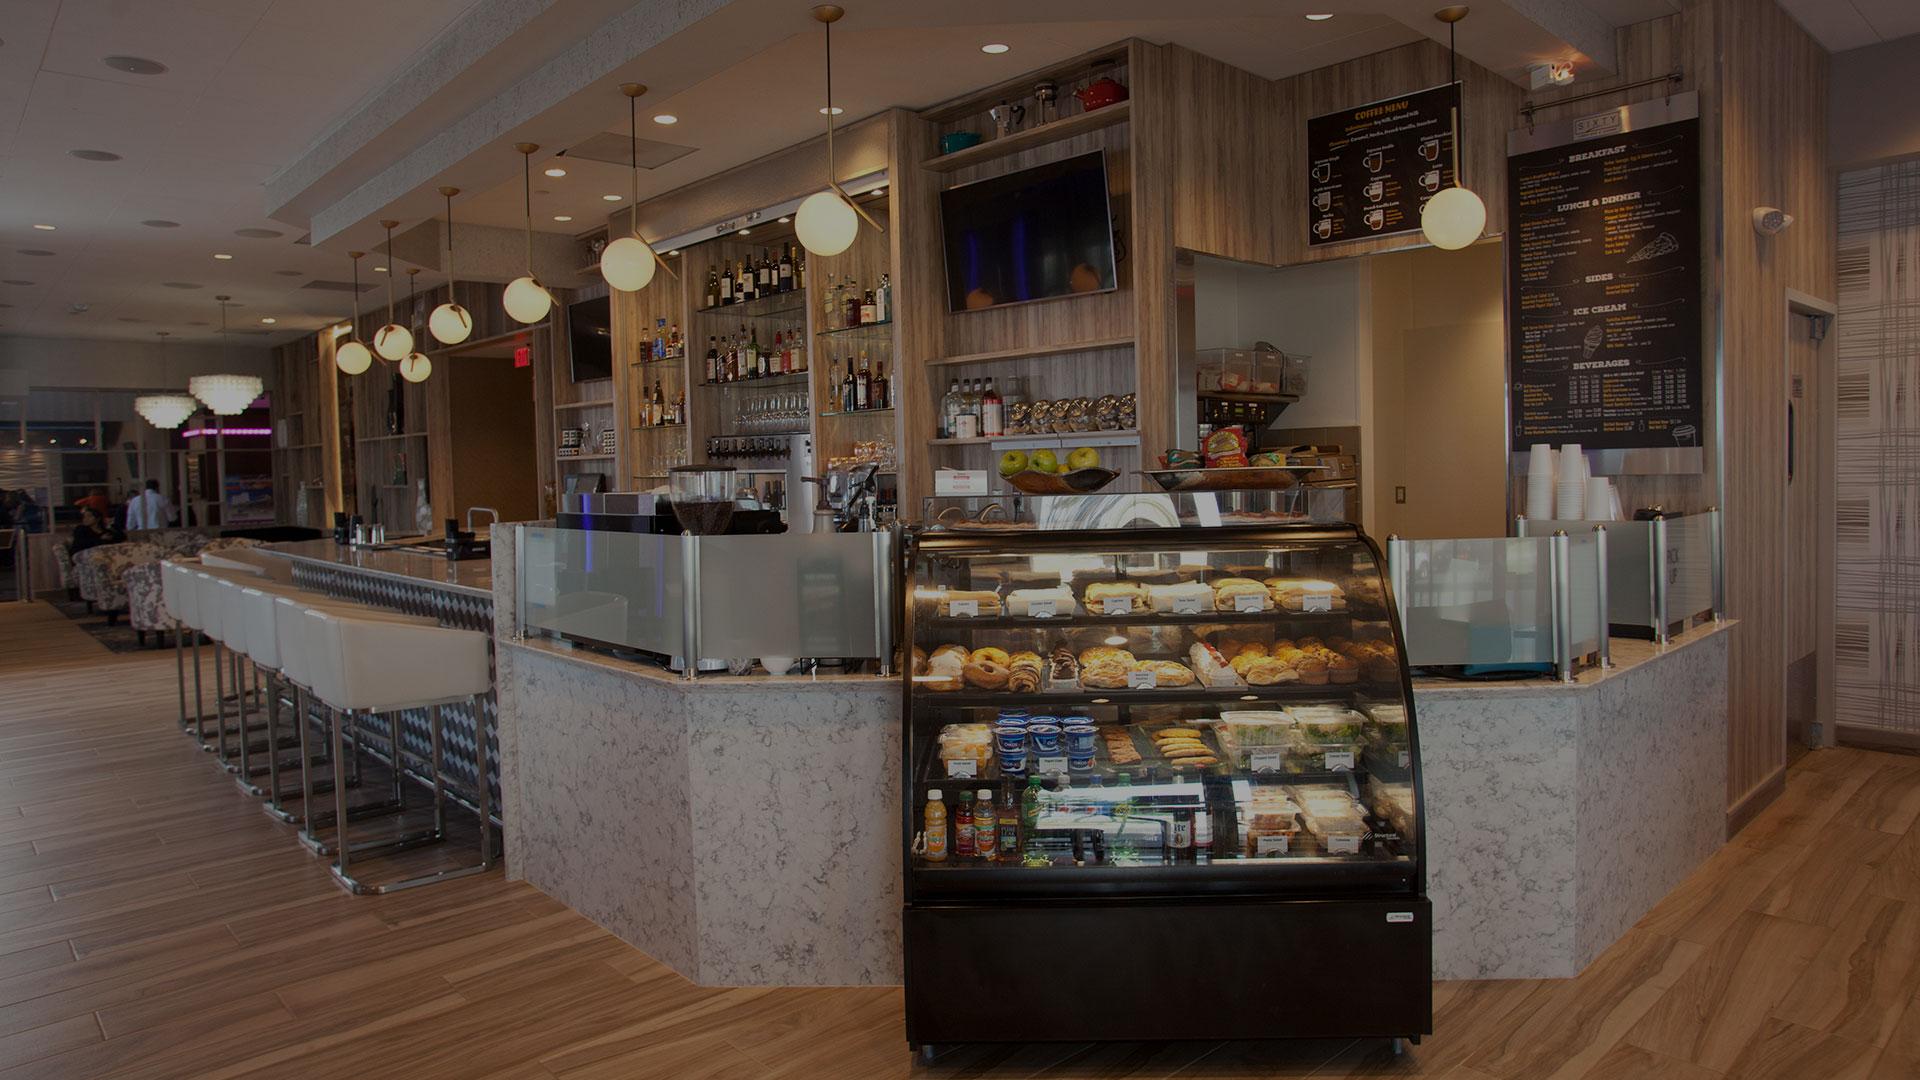 Sixty Gallery - Sixty Cafe & Bar - FantaSea Resorts - Atlantic City, NJ